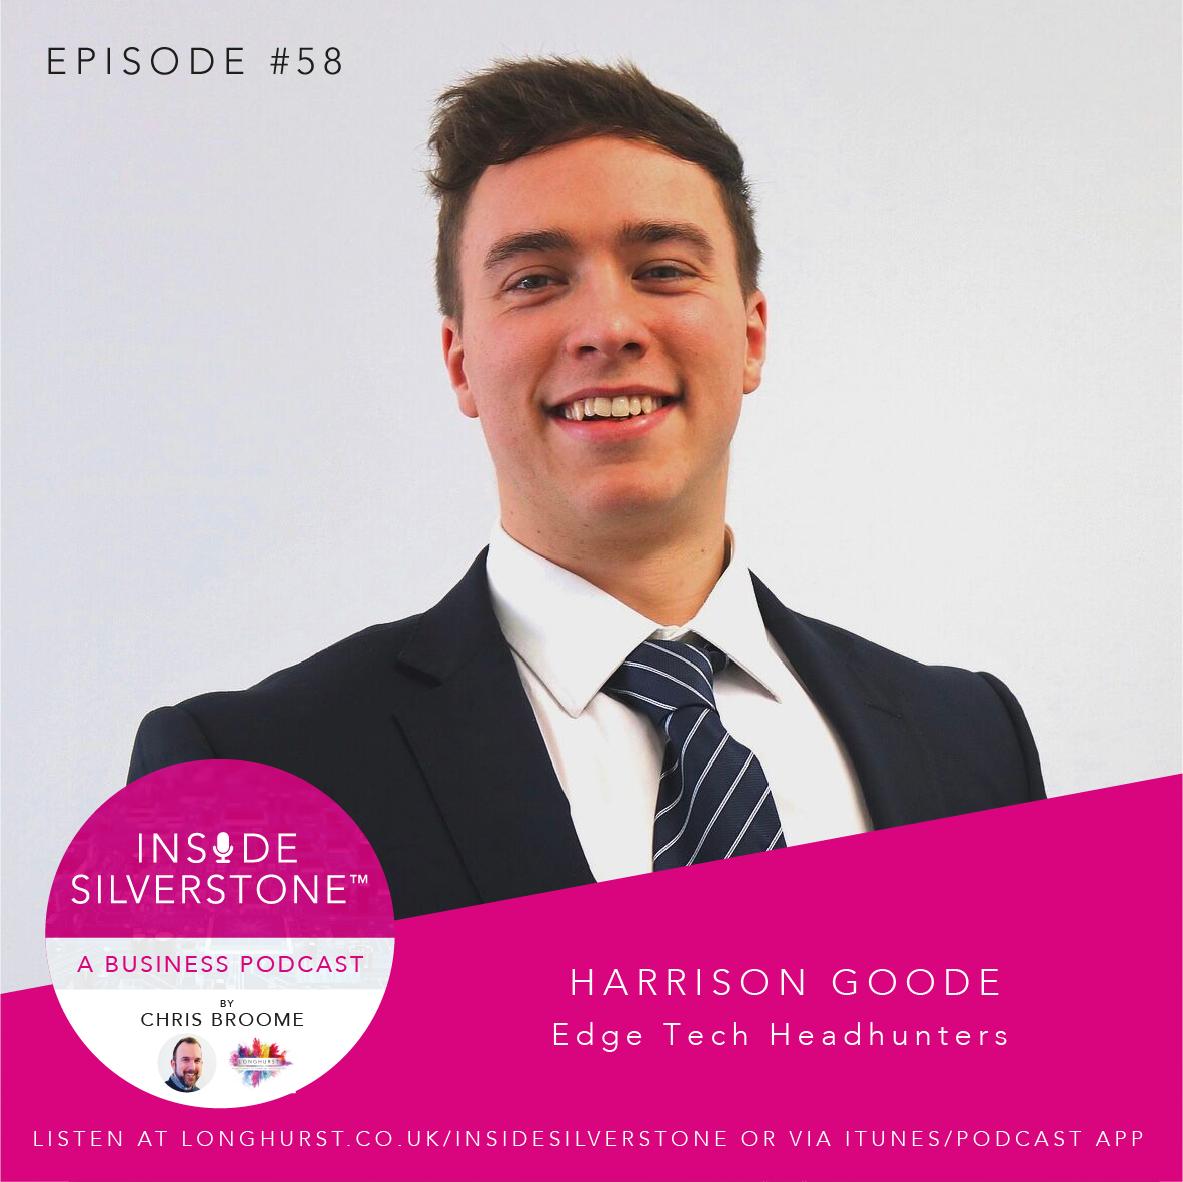 Harrison Goode of Edge Tech Headhunters